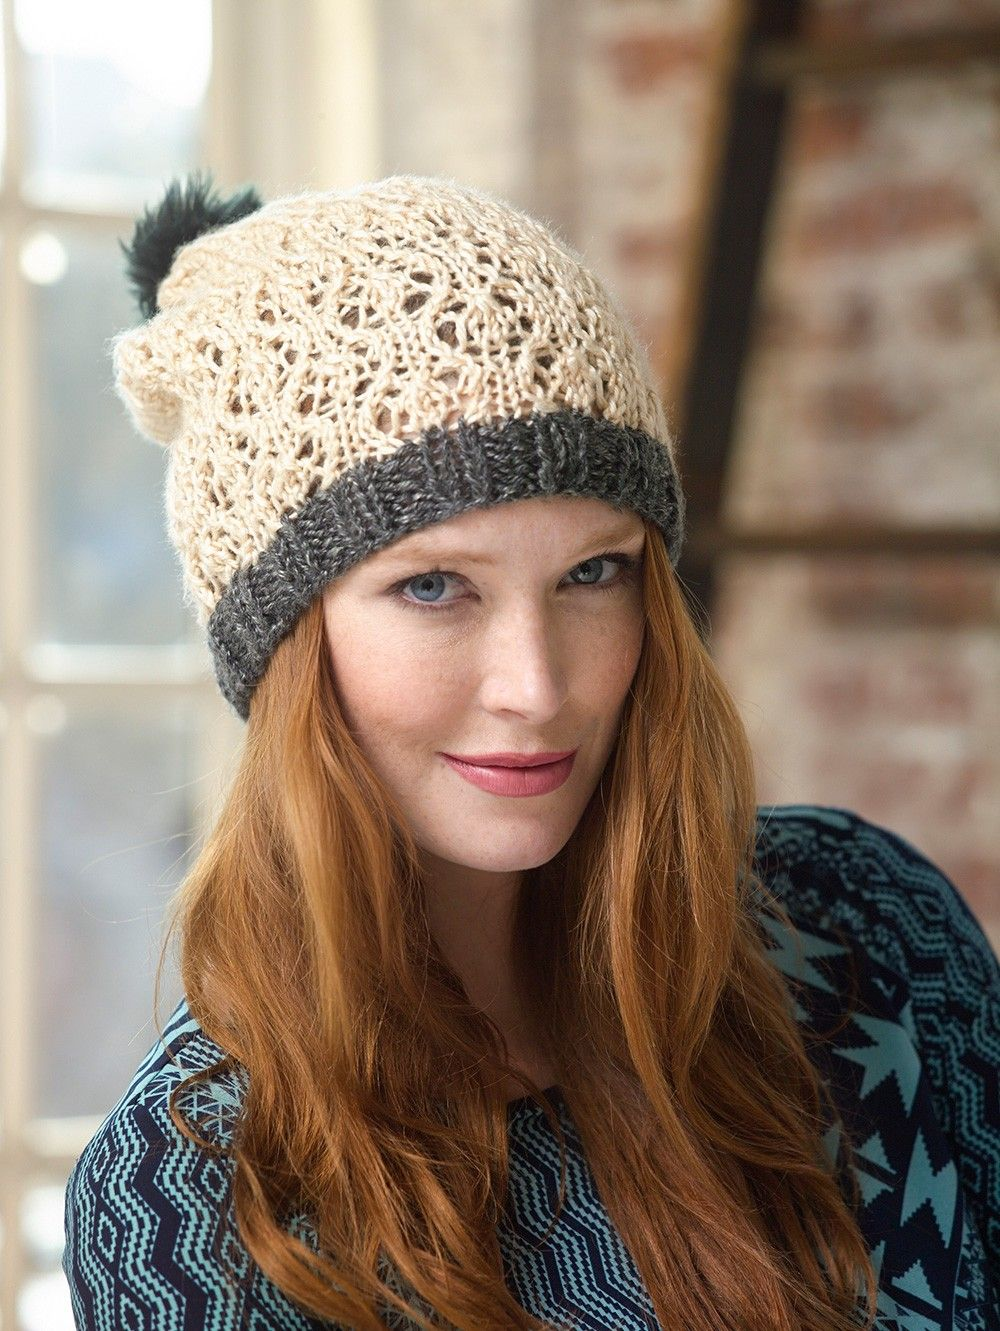 Lacework Hat Pattern (Knit) | Crochnit | Pinterest | Patterns, Knit ...